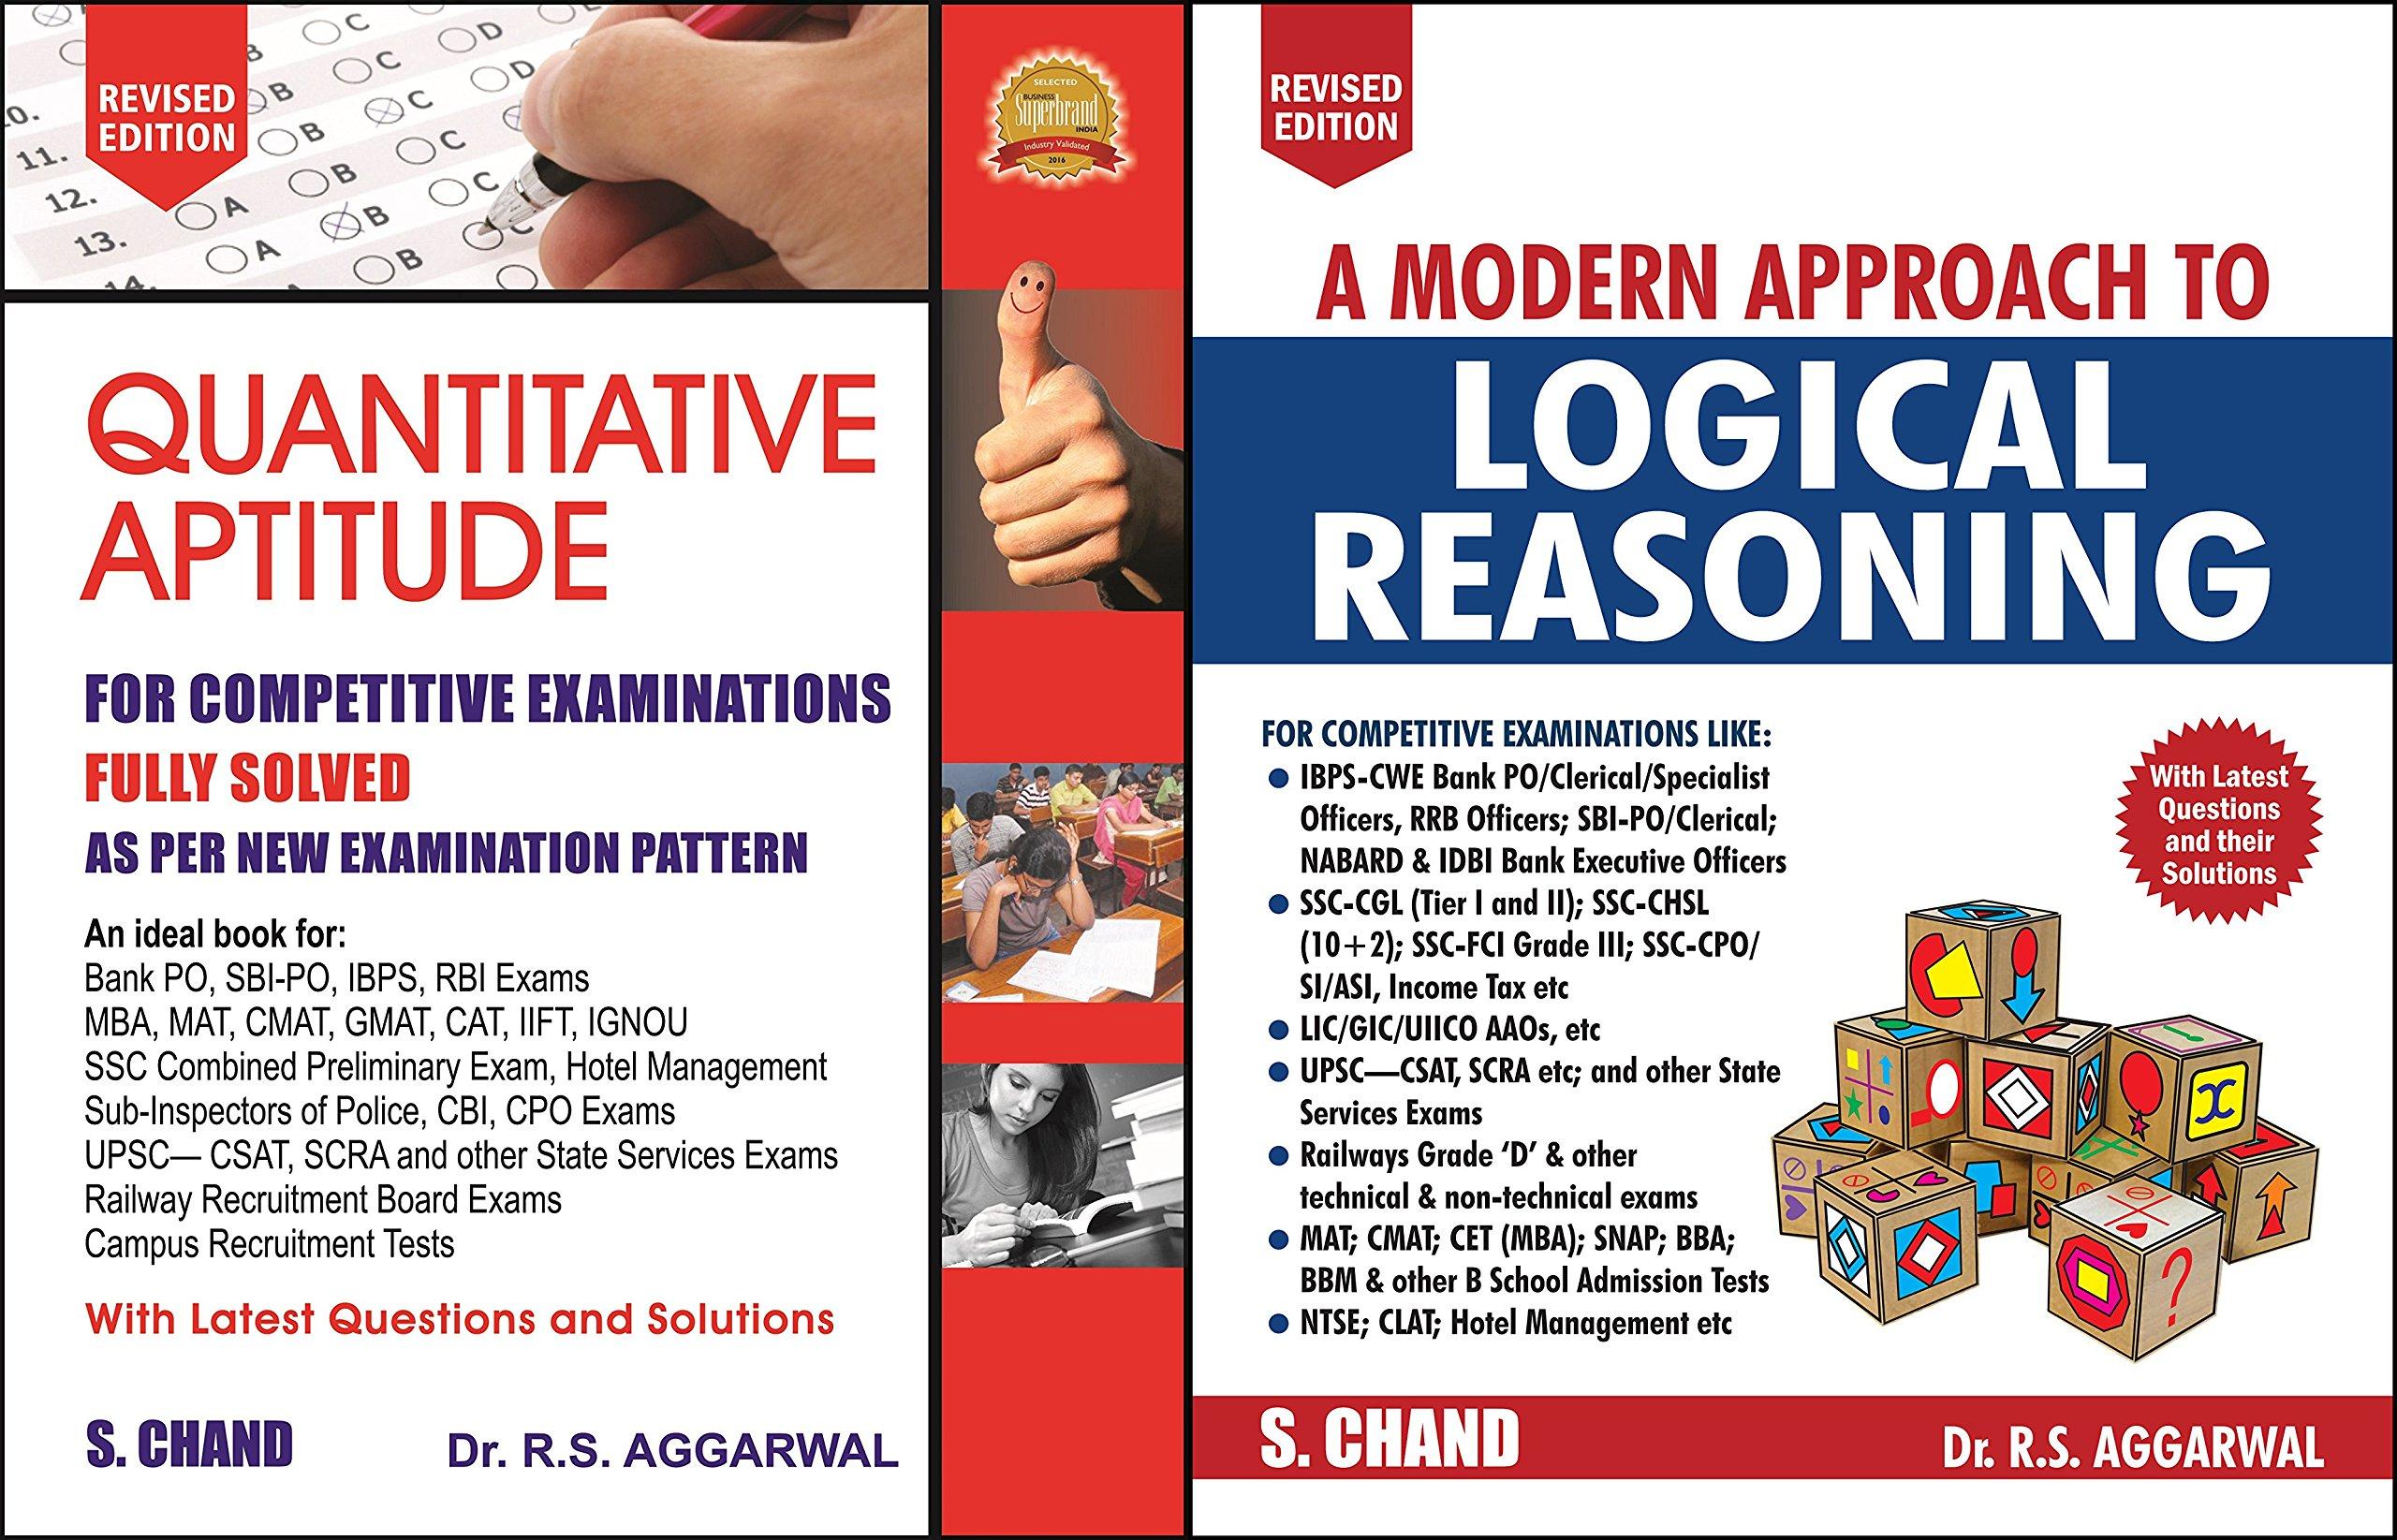 Buy Quantitative Aptitude for Competitive Examinations with